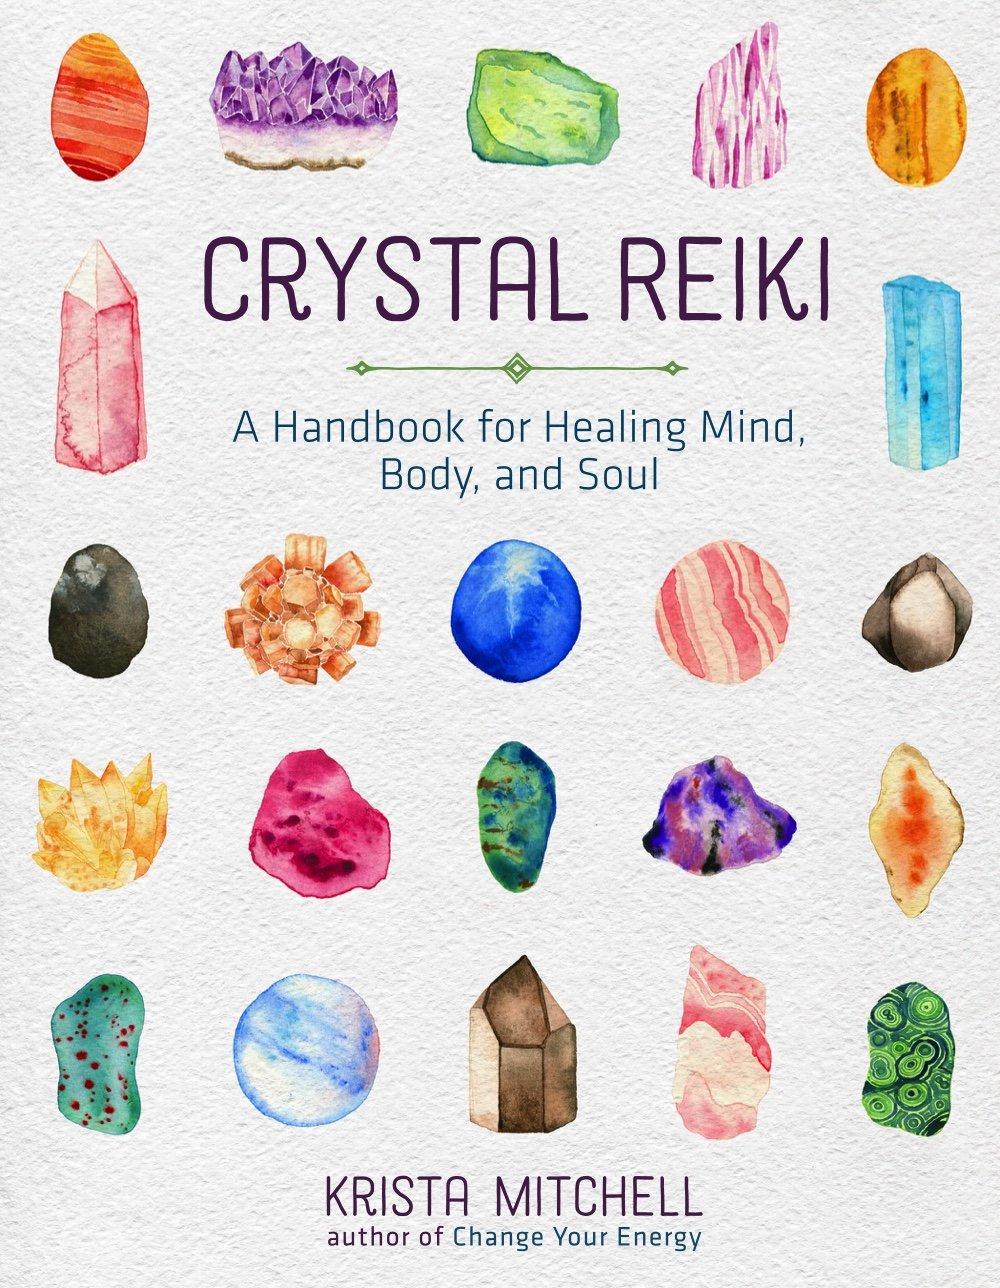 Crystal Reiki / krista-mitchell.com